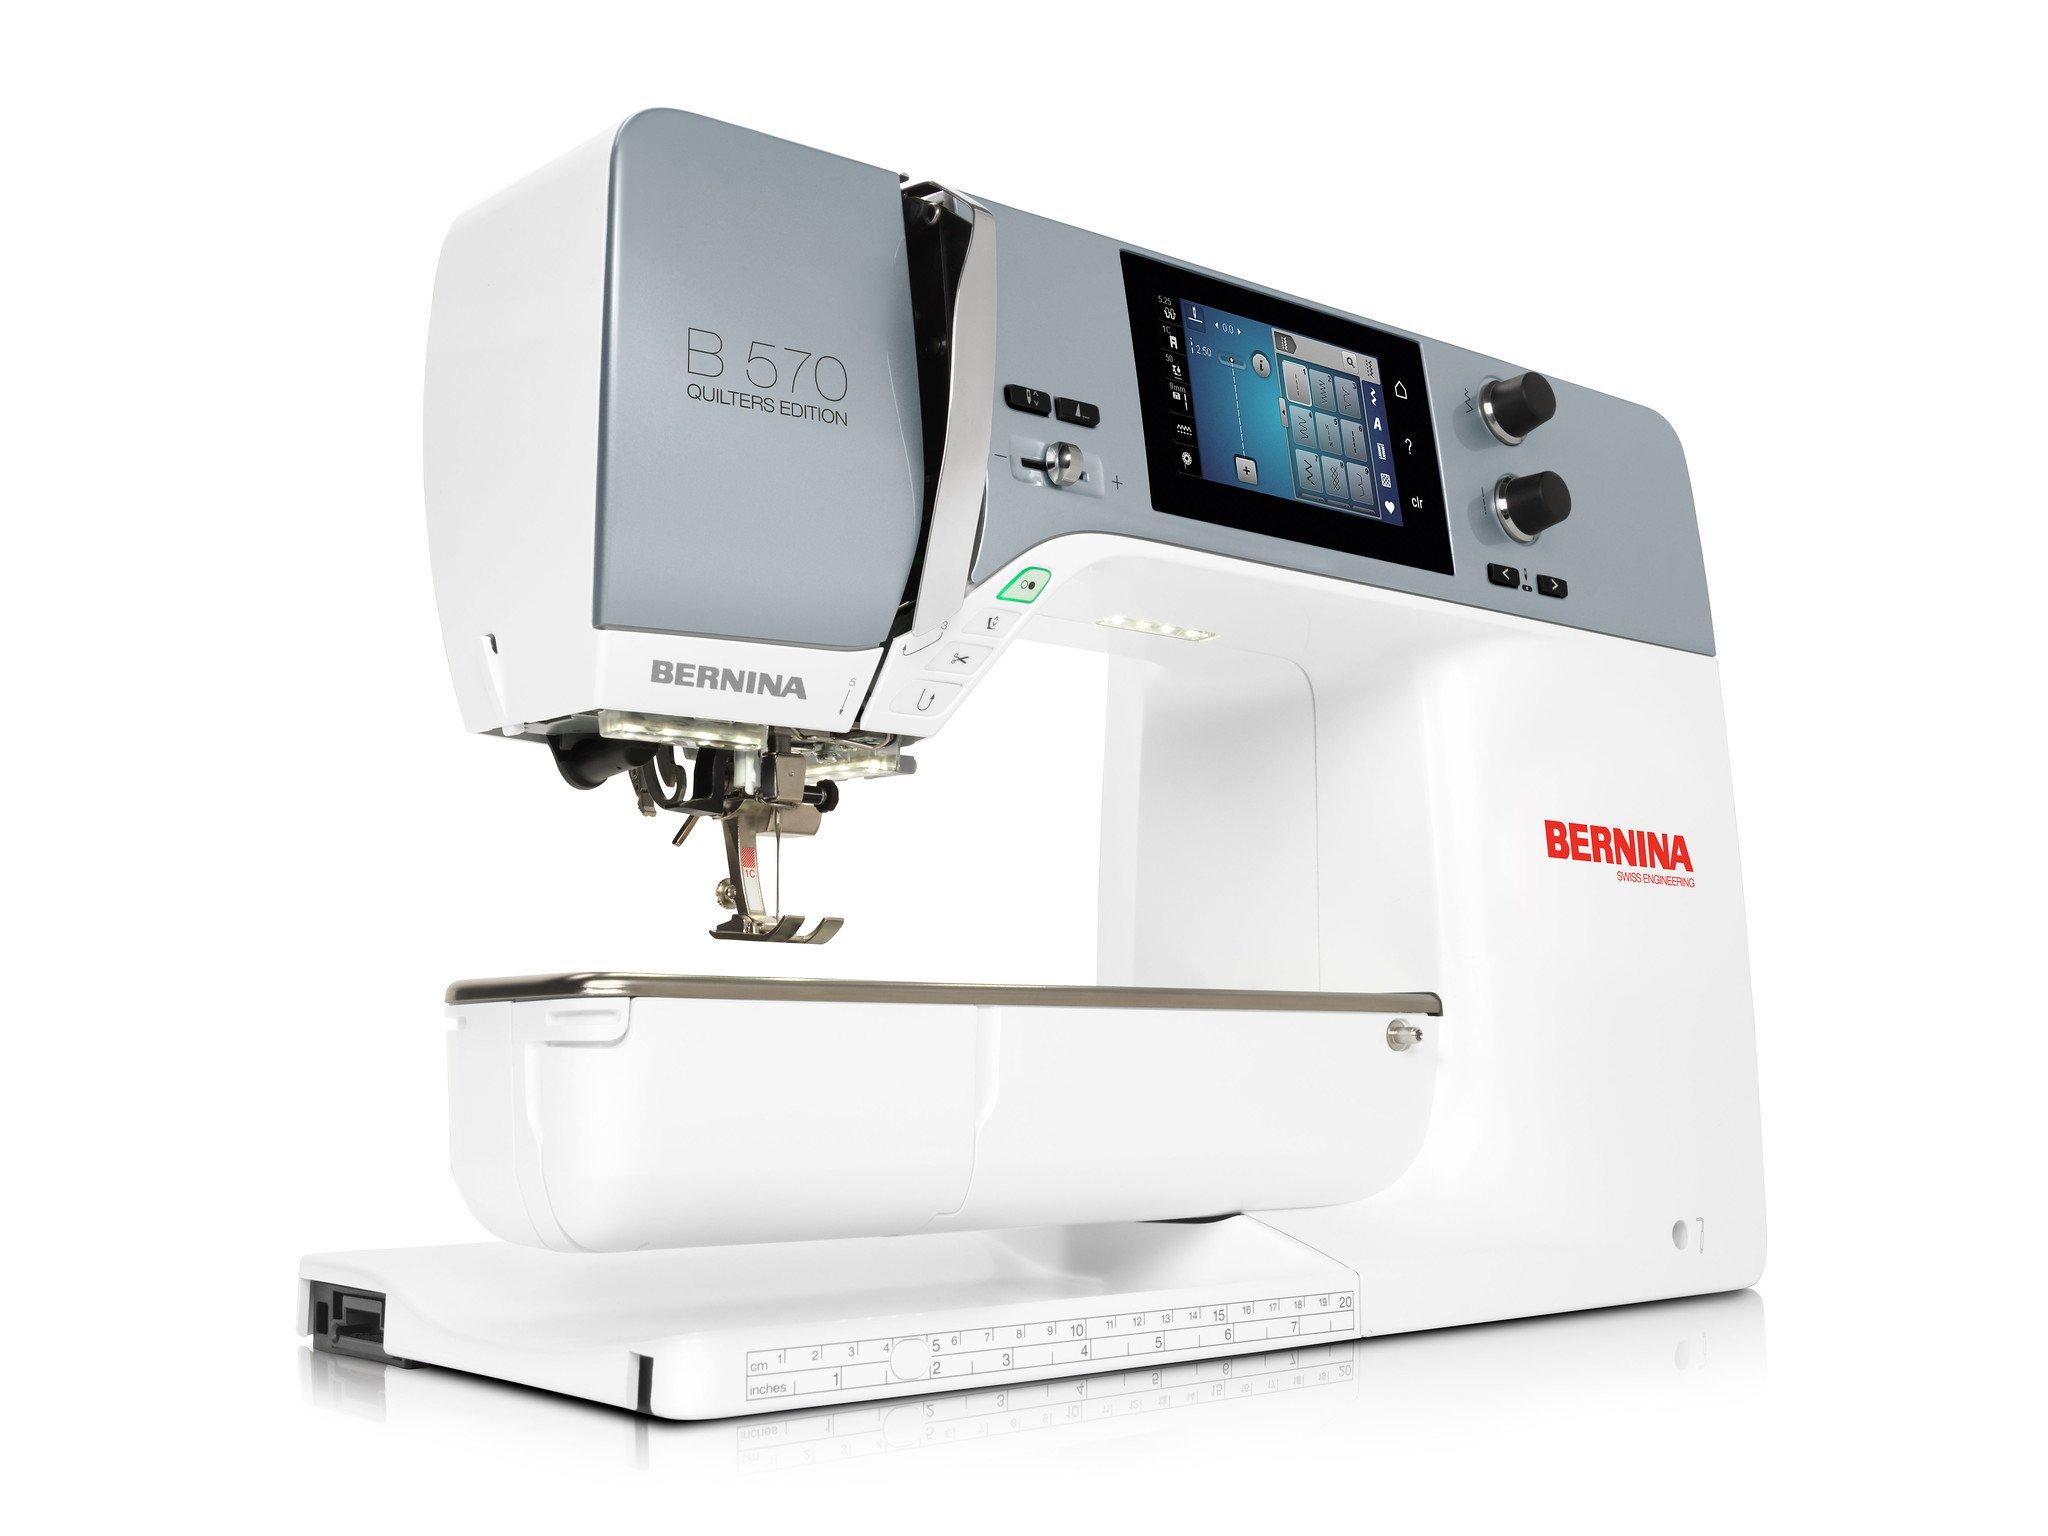 Final raffle: BERNINA Sewing Machine B 570 QE